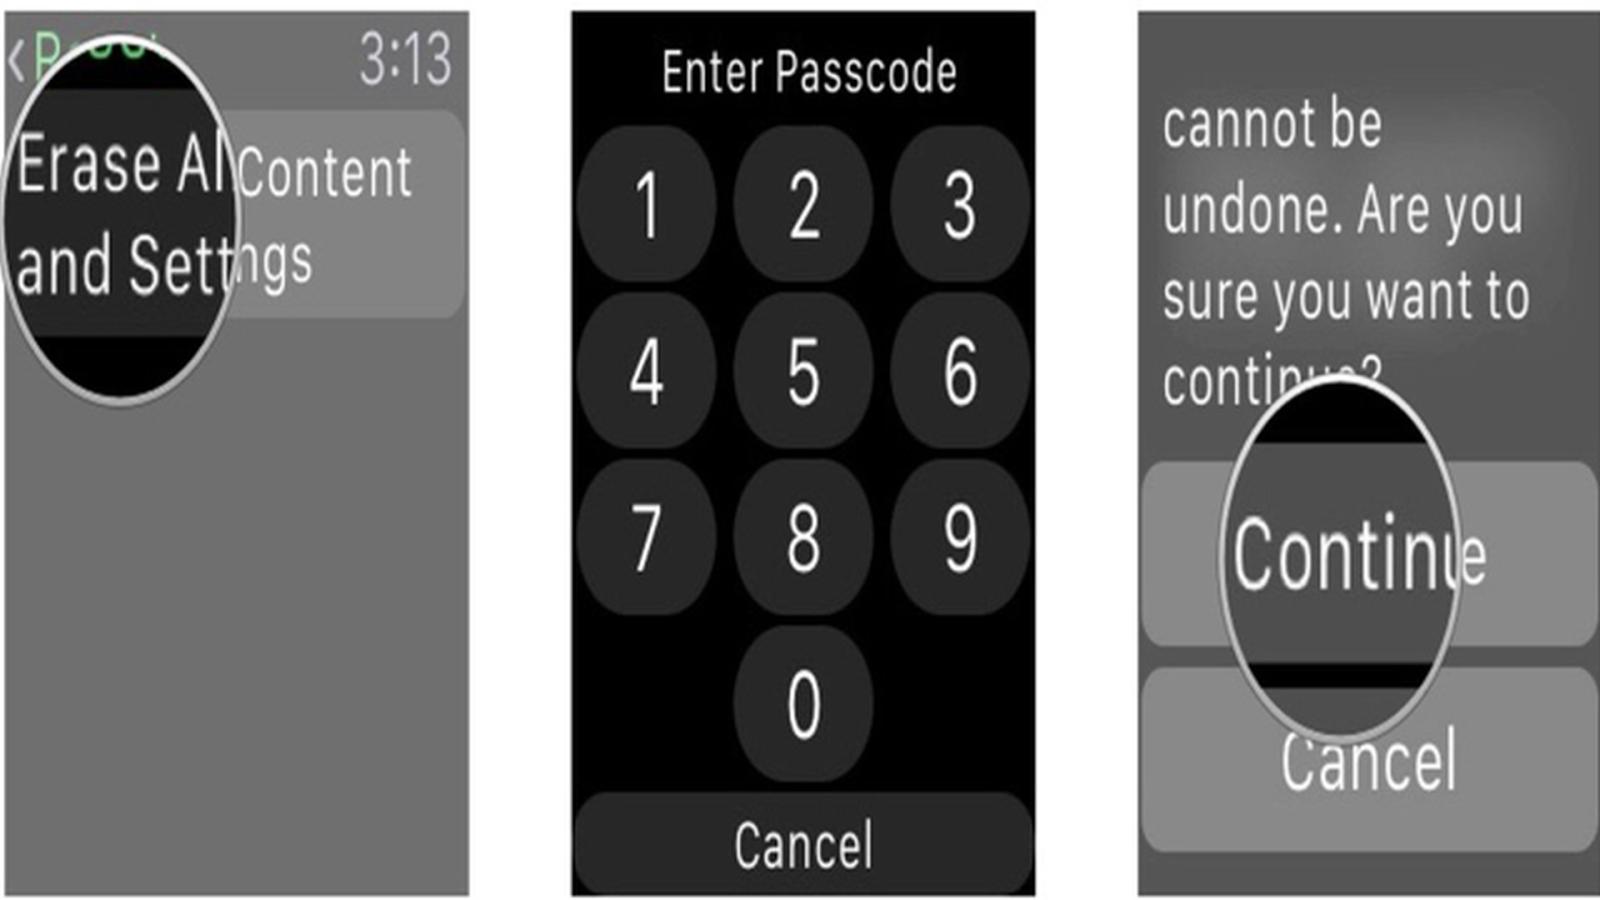 How to Restart Apple Watch 3 | Apple Watch 3 Guide